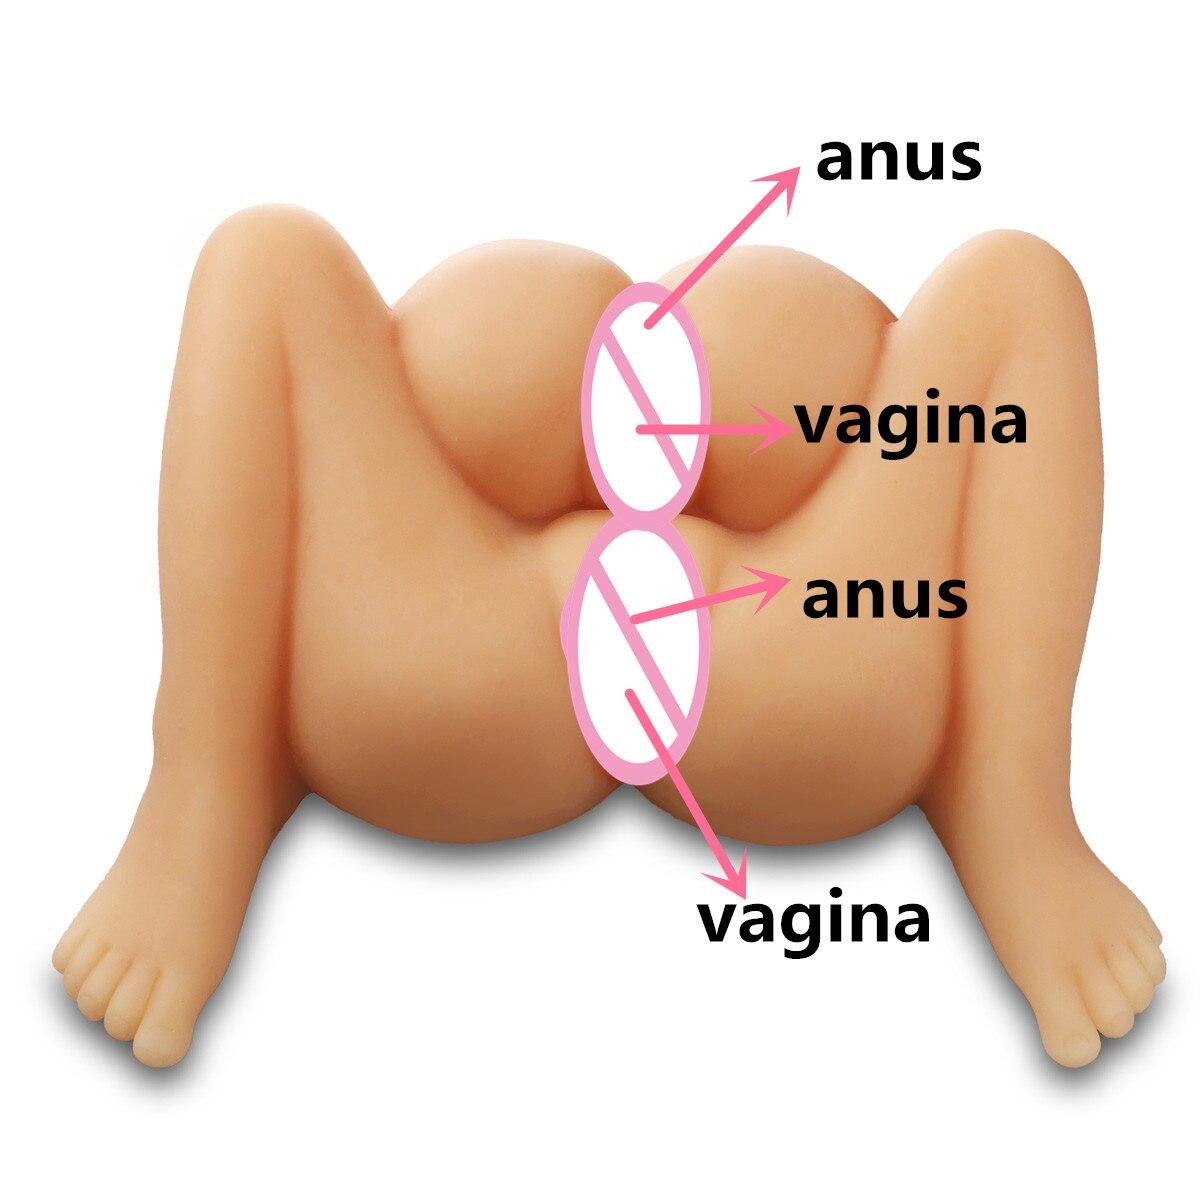 Images of porno girls australia